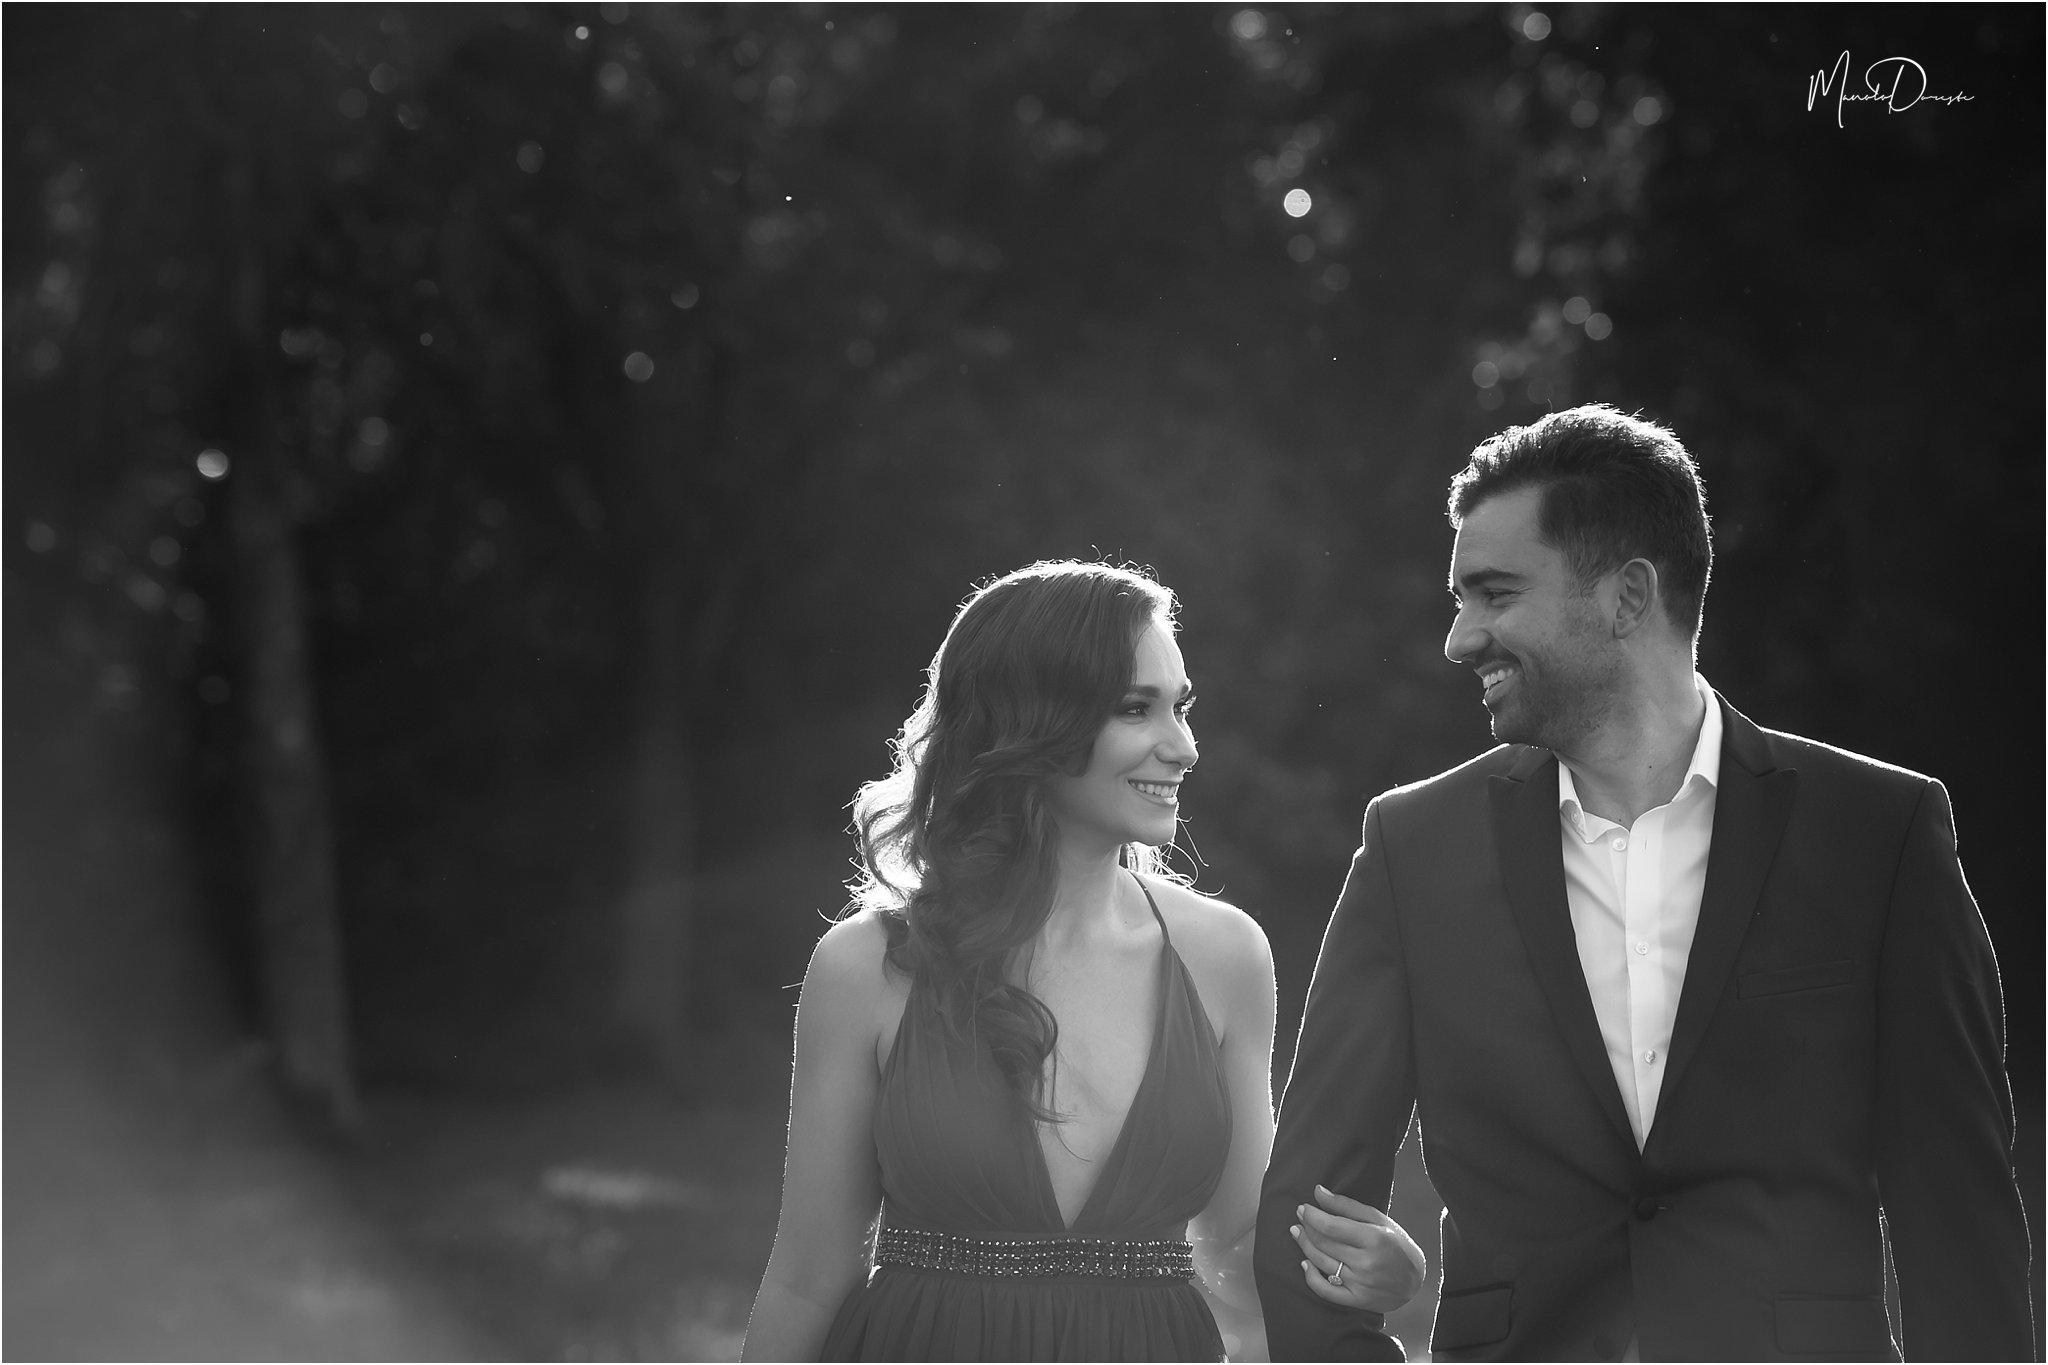 00819_ManoloDoreste_InFocusStudios_Wedding_Family_Photography_Miami_MiamiPhotographer.jpg